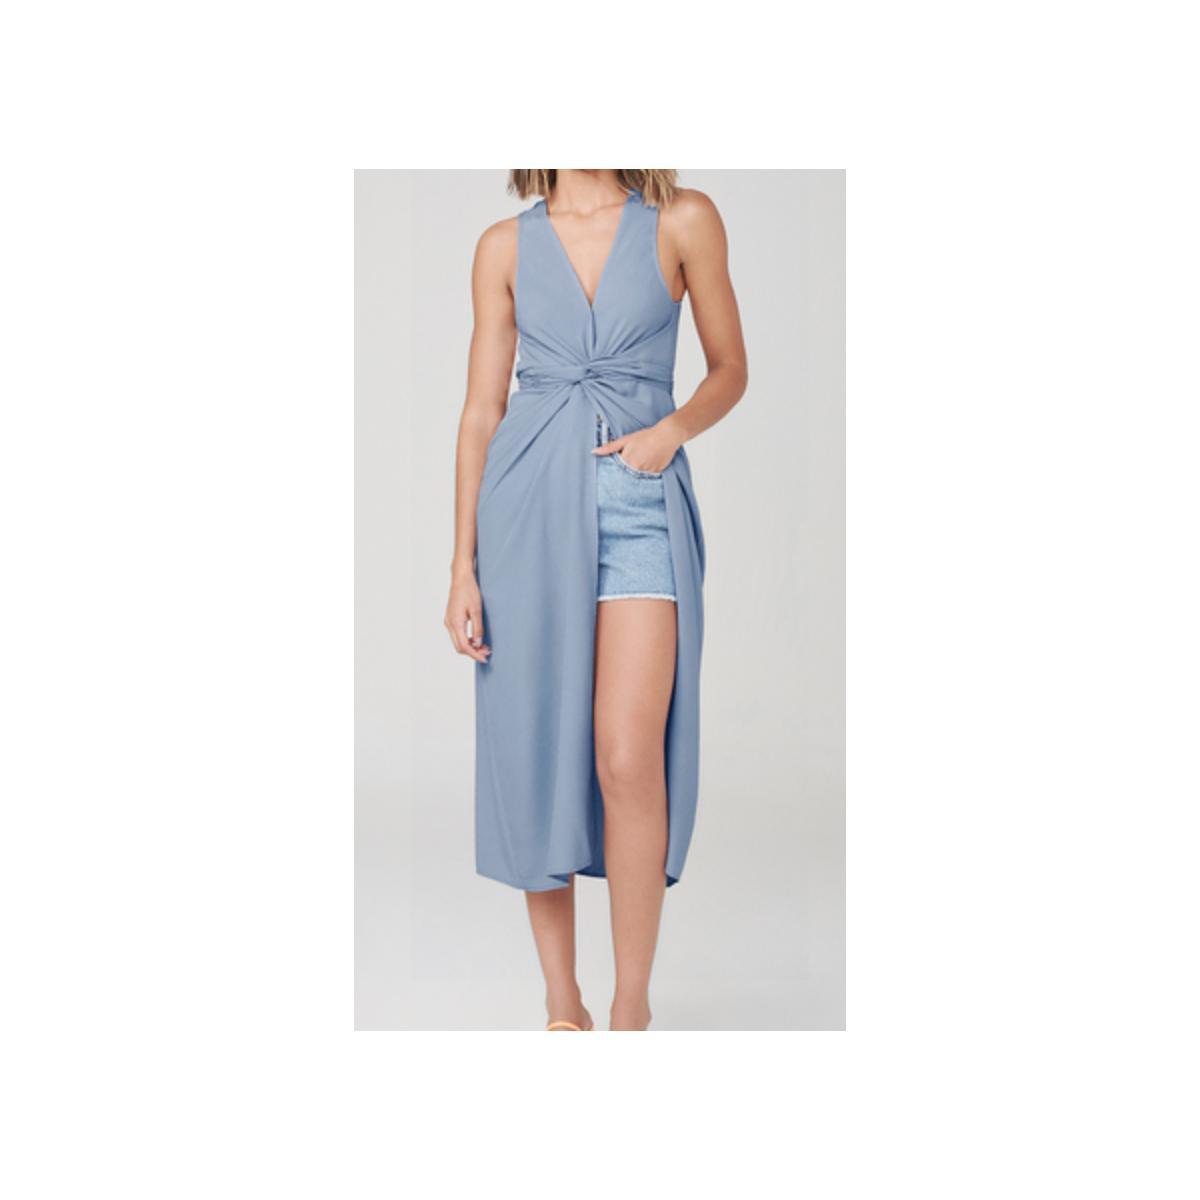 Vestido Feminino Dzarm Zatd Az3en Azul